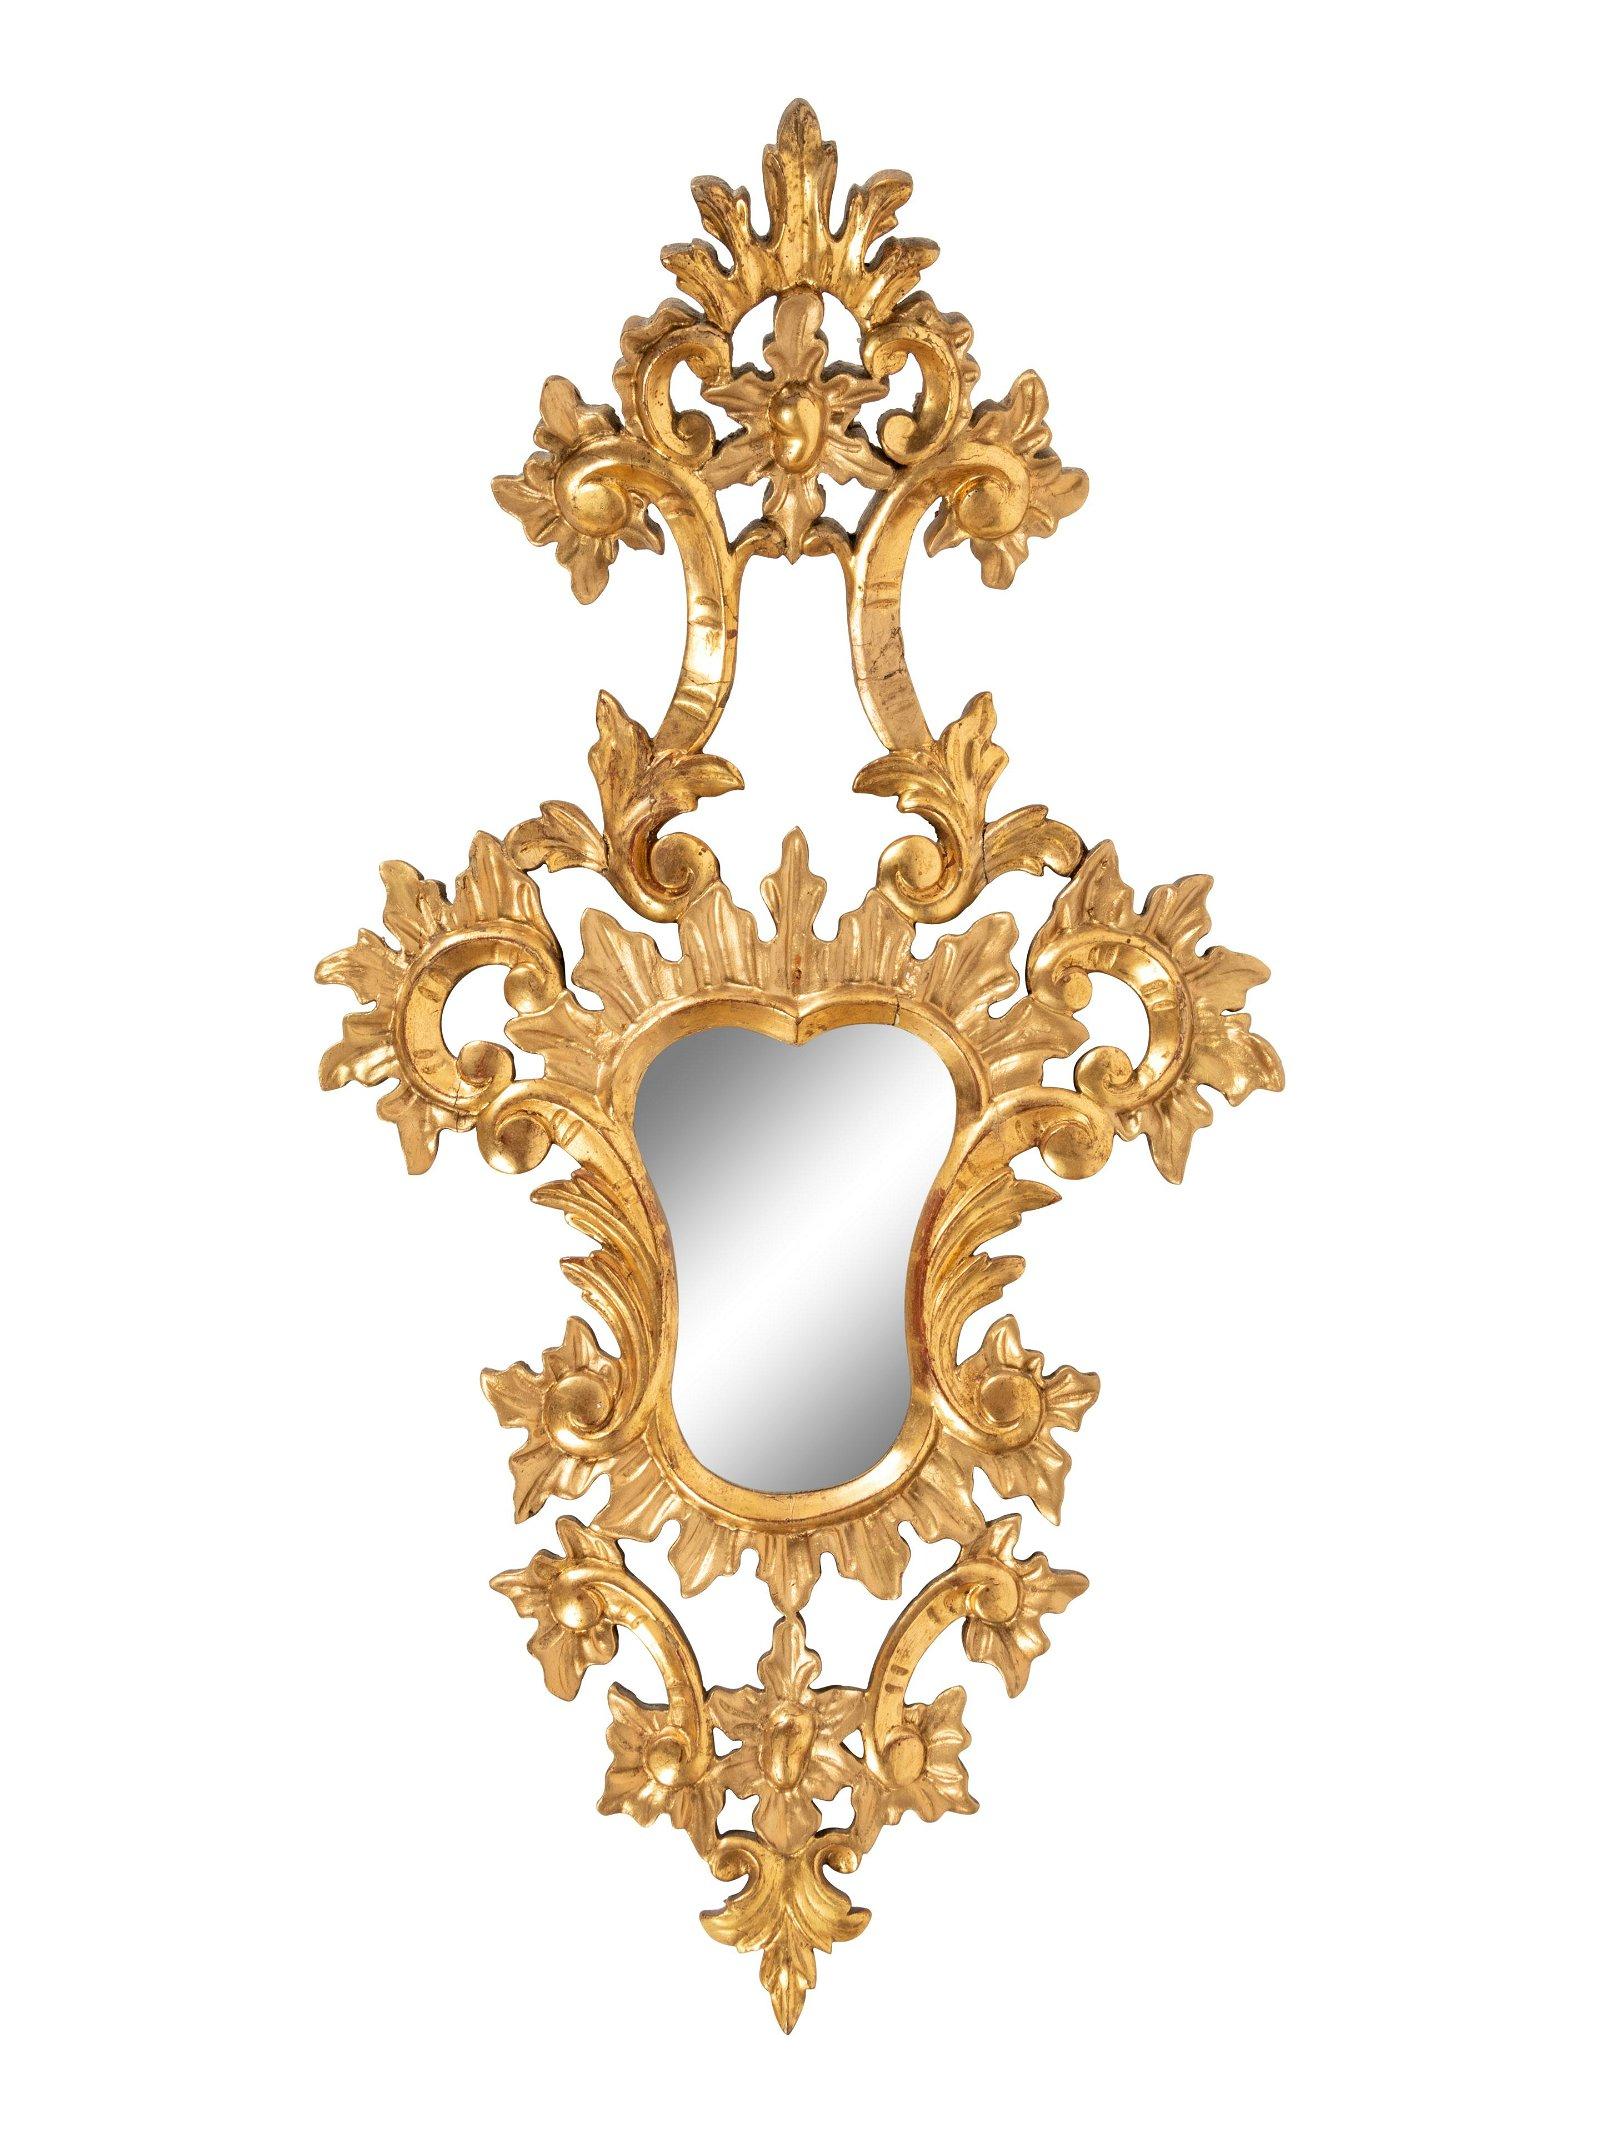 A Venetian Style Giltwood Mirror